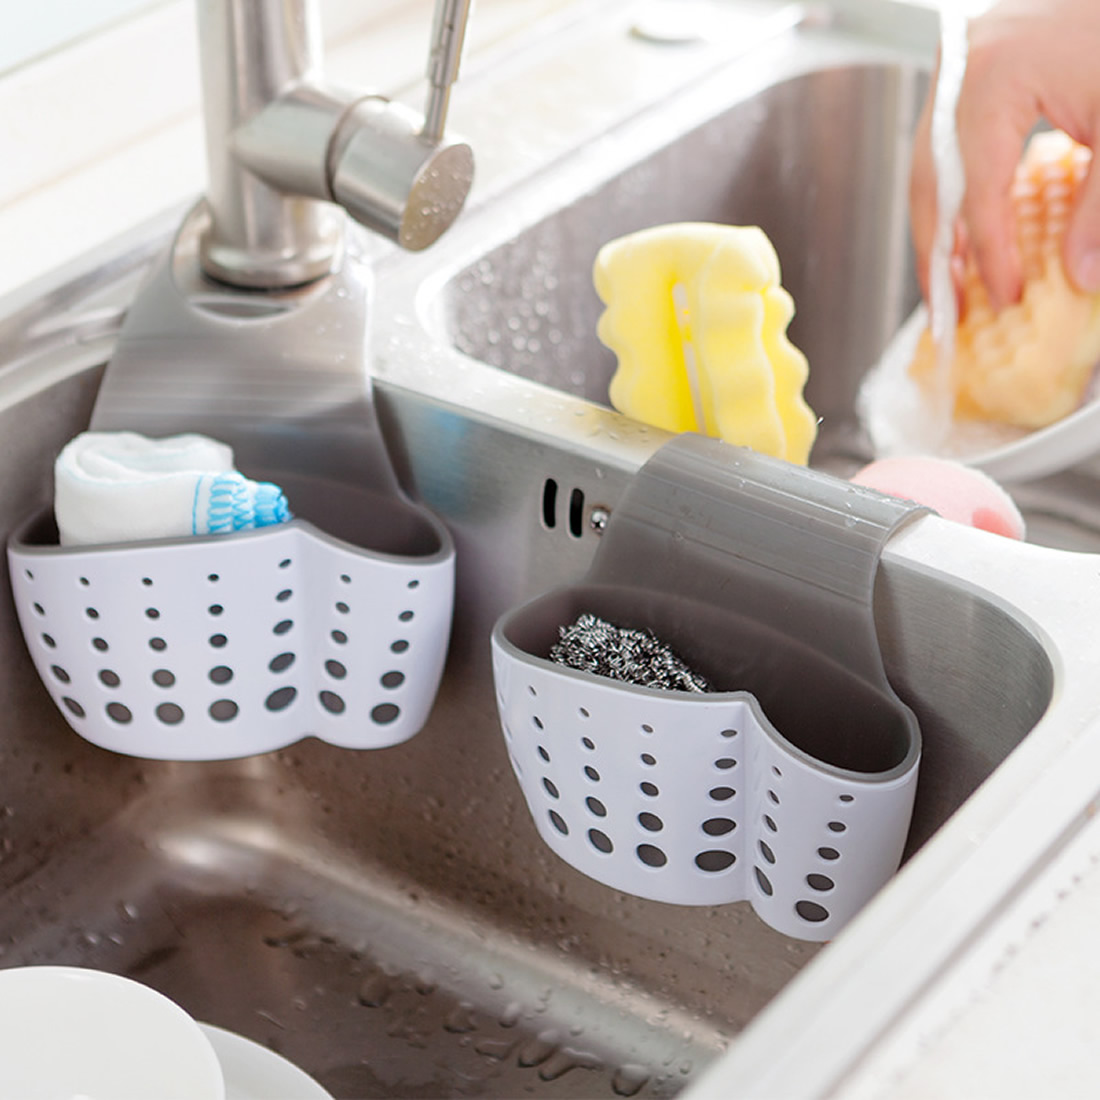 Kitchen Sink Accessories Basket Sink Accessories Draining Basket Promotionshop For Promotional